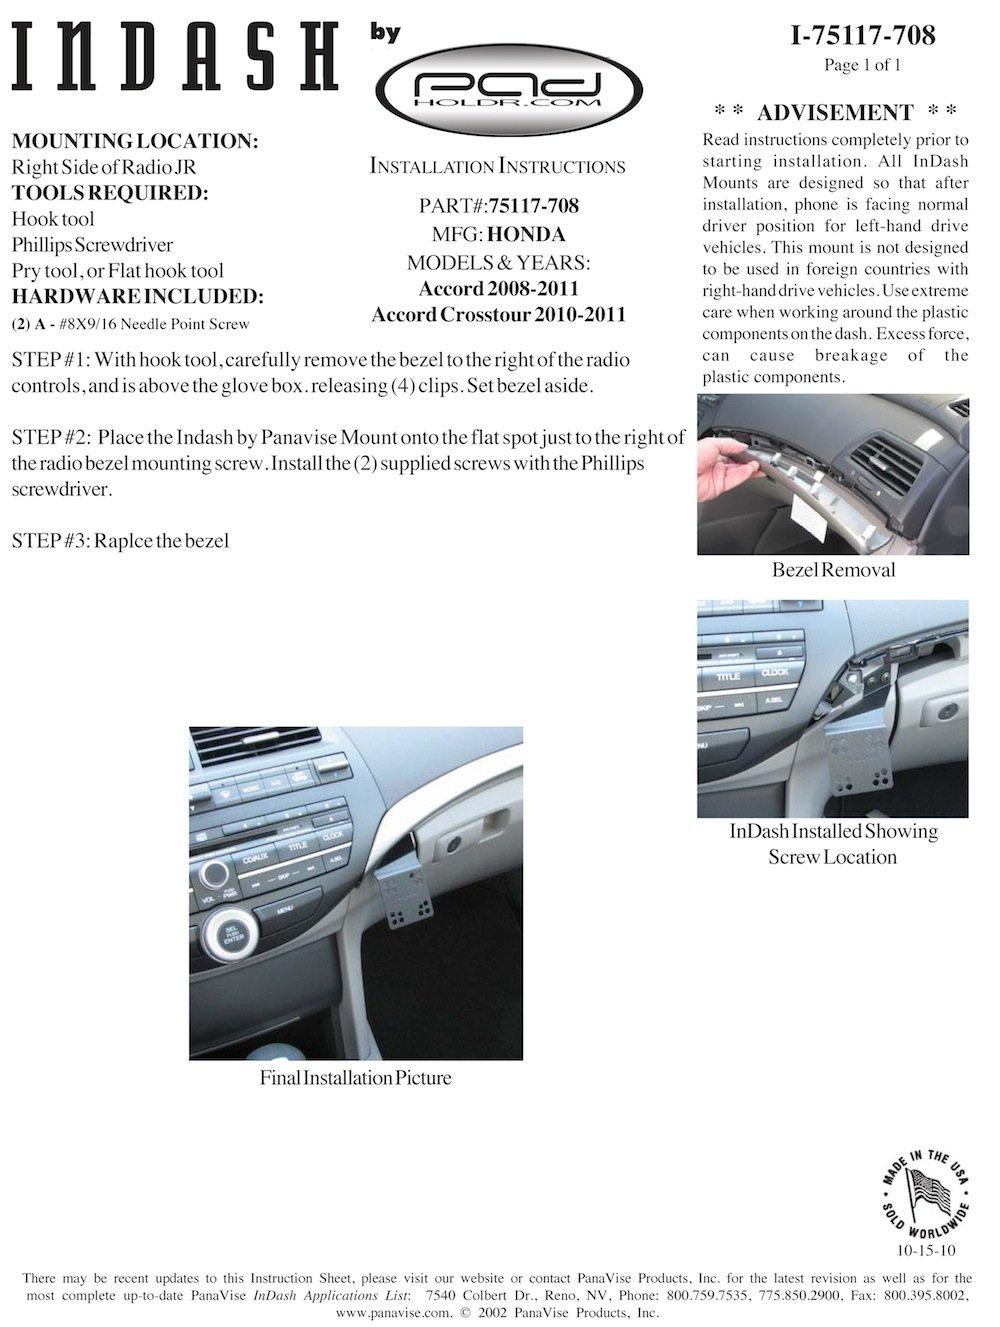 Padholdr Ram Lock Series Lock and Dock iPad Dash Kit for 2008-2011 Honda Accord//Crosstour Pad Holdr PHRLD3275117-708